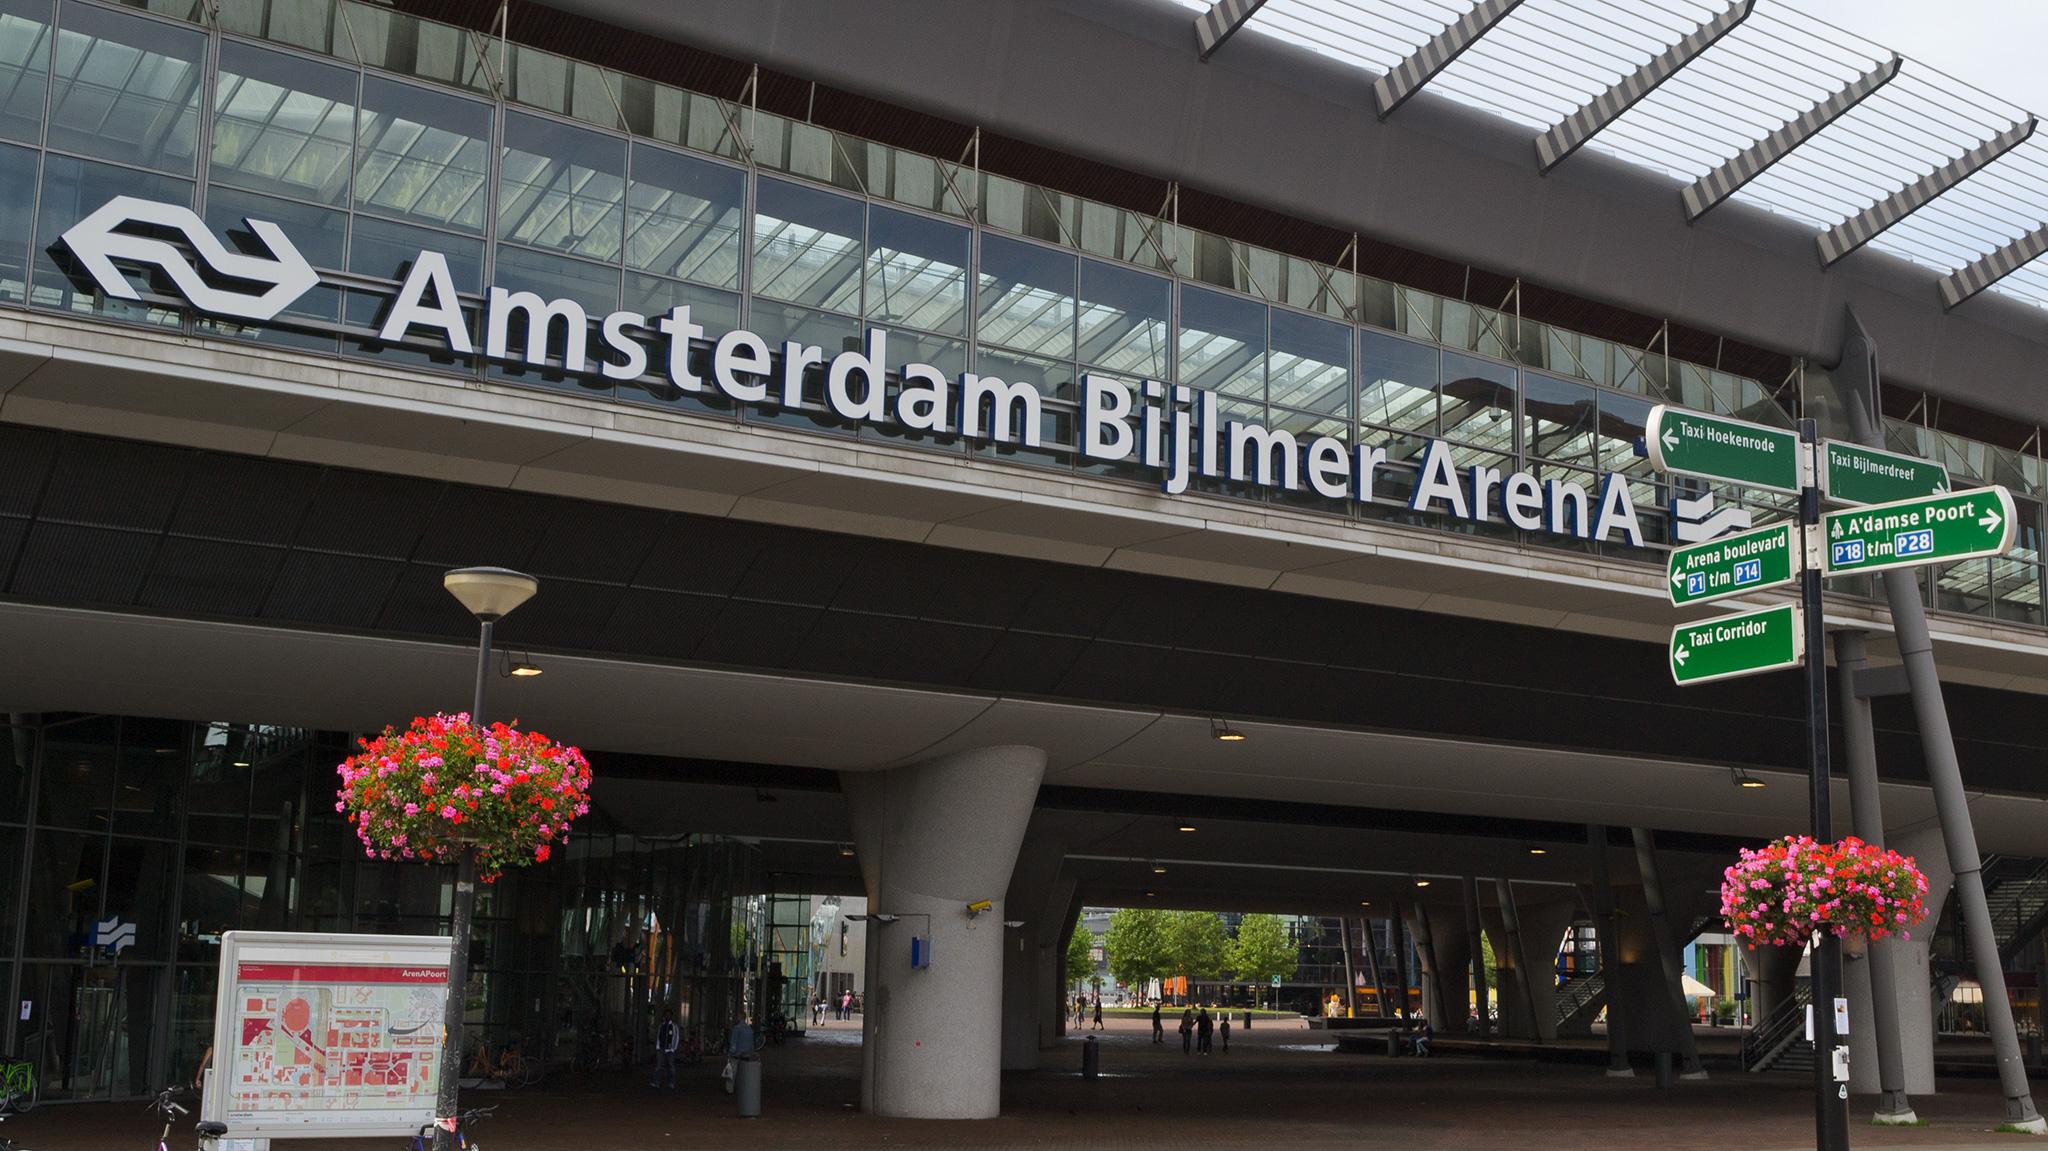 amsterdam arena (80)